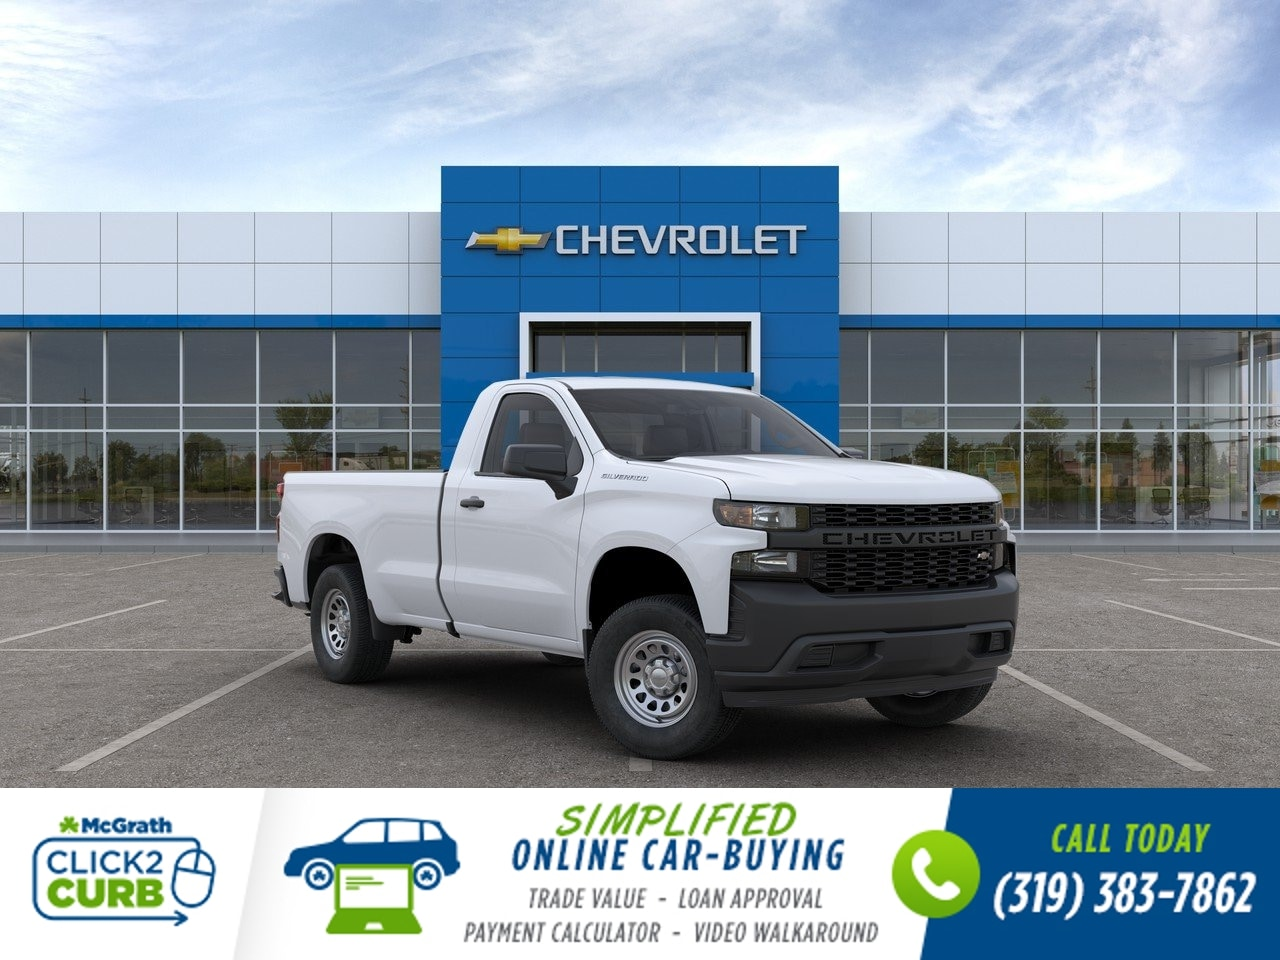 2020 Chevrolet Silverado 1500 Regular Cab 4x2, Pickup #C201040 - photo 1